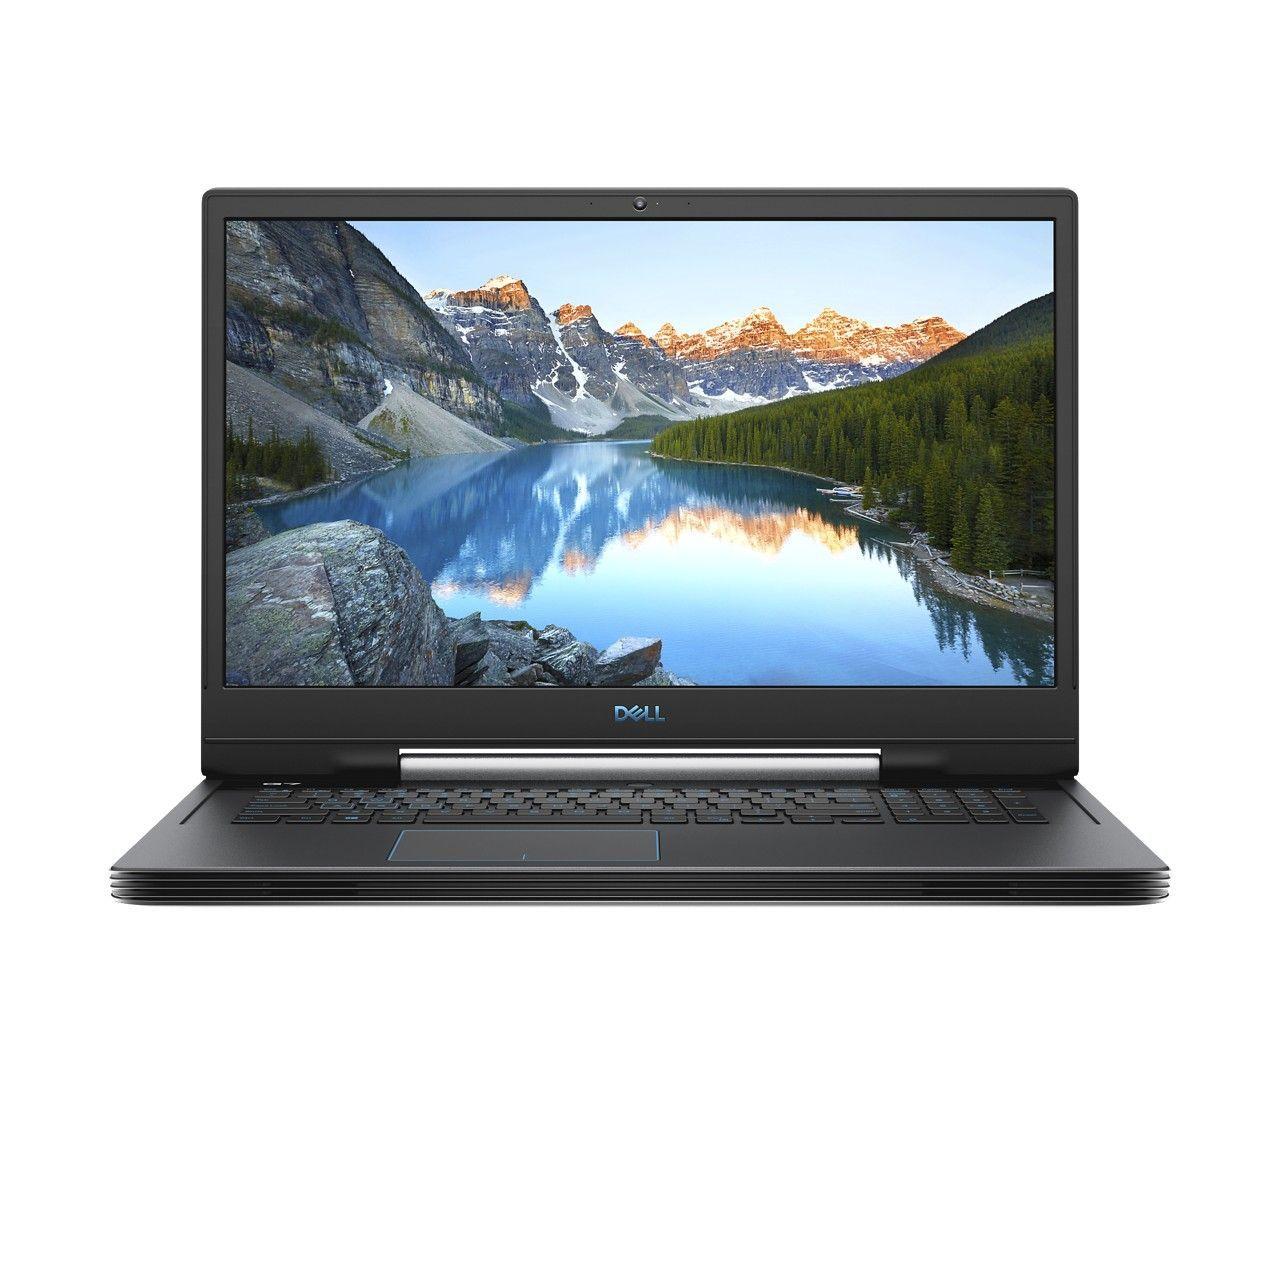 "Dell G7-E1297 Gaming Laptop i7-9750H/16 GB/1 TB HDD + 256 GB SSD/NVIDIA GeForce RTX 2070 8 GB/17.3"" FHD/144Hz Refresh Rate/Windows 10/Grey"